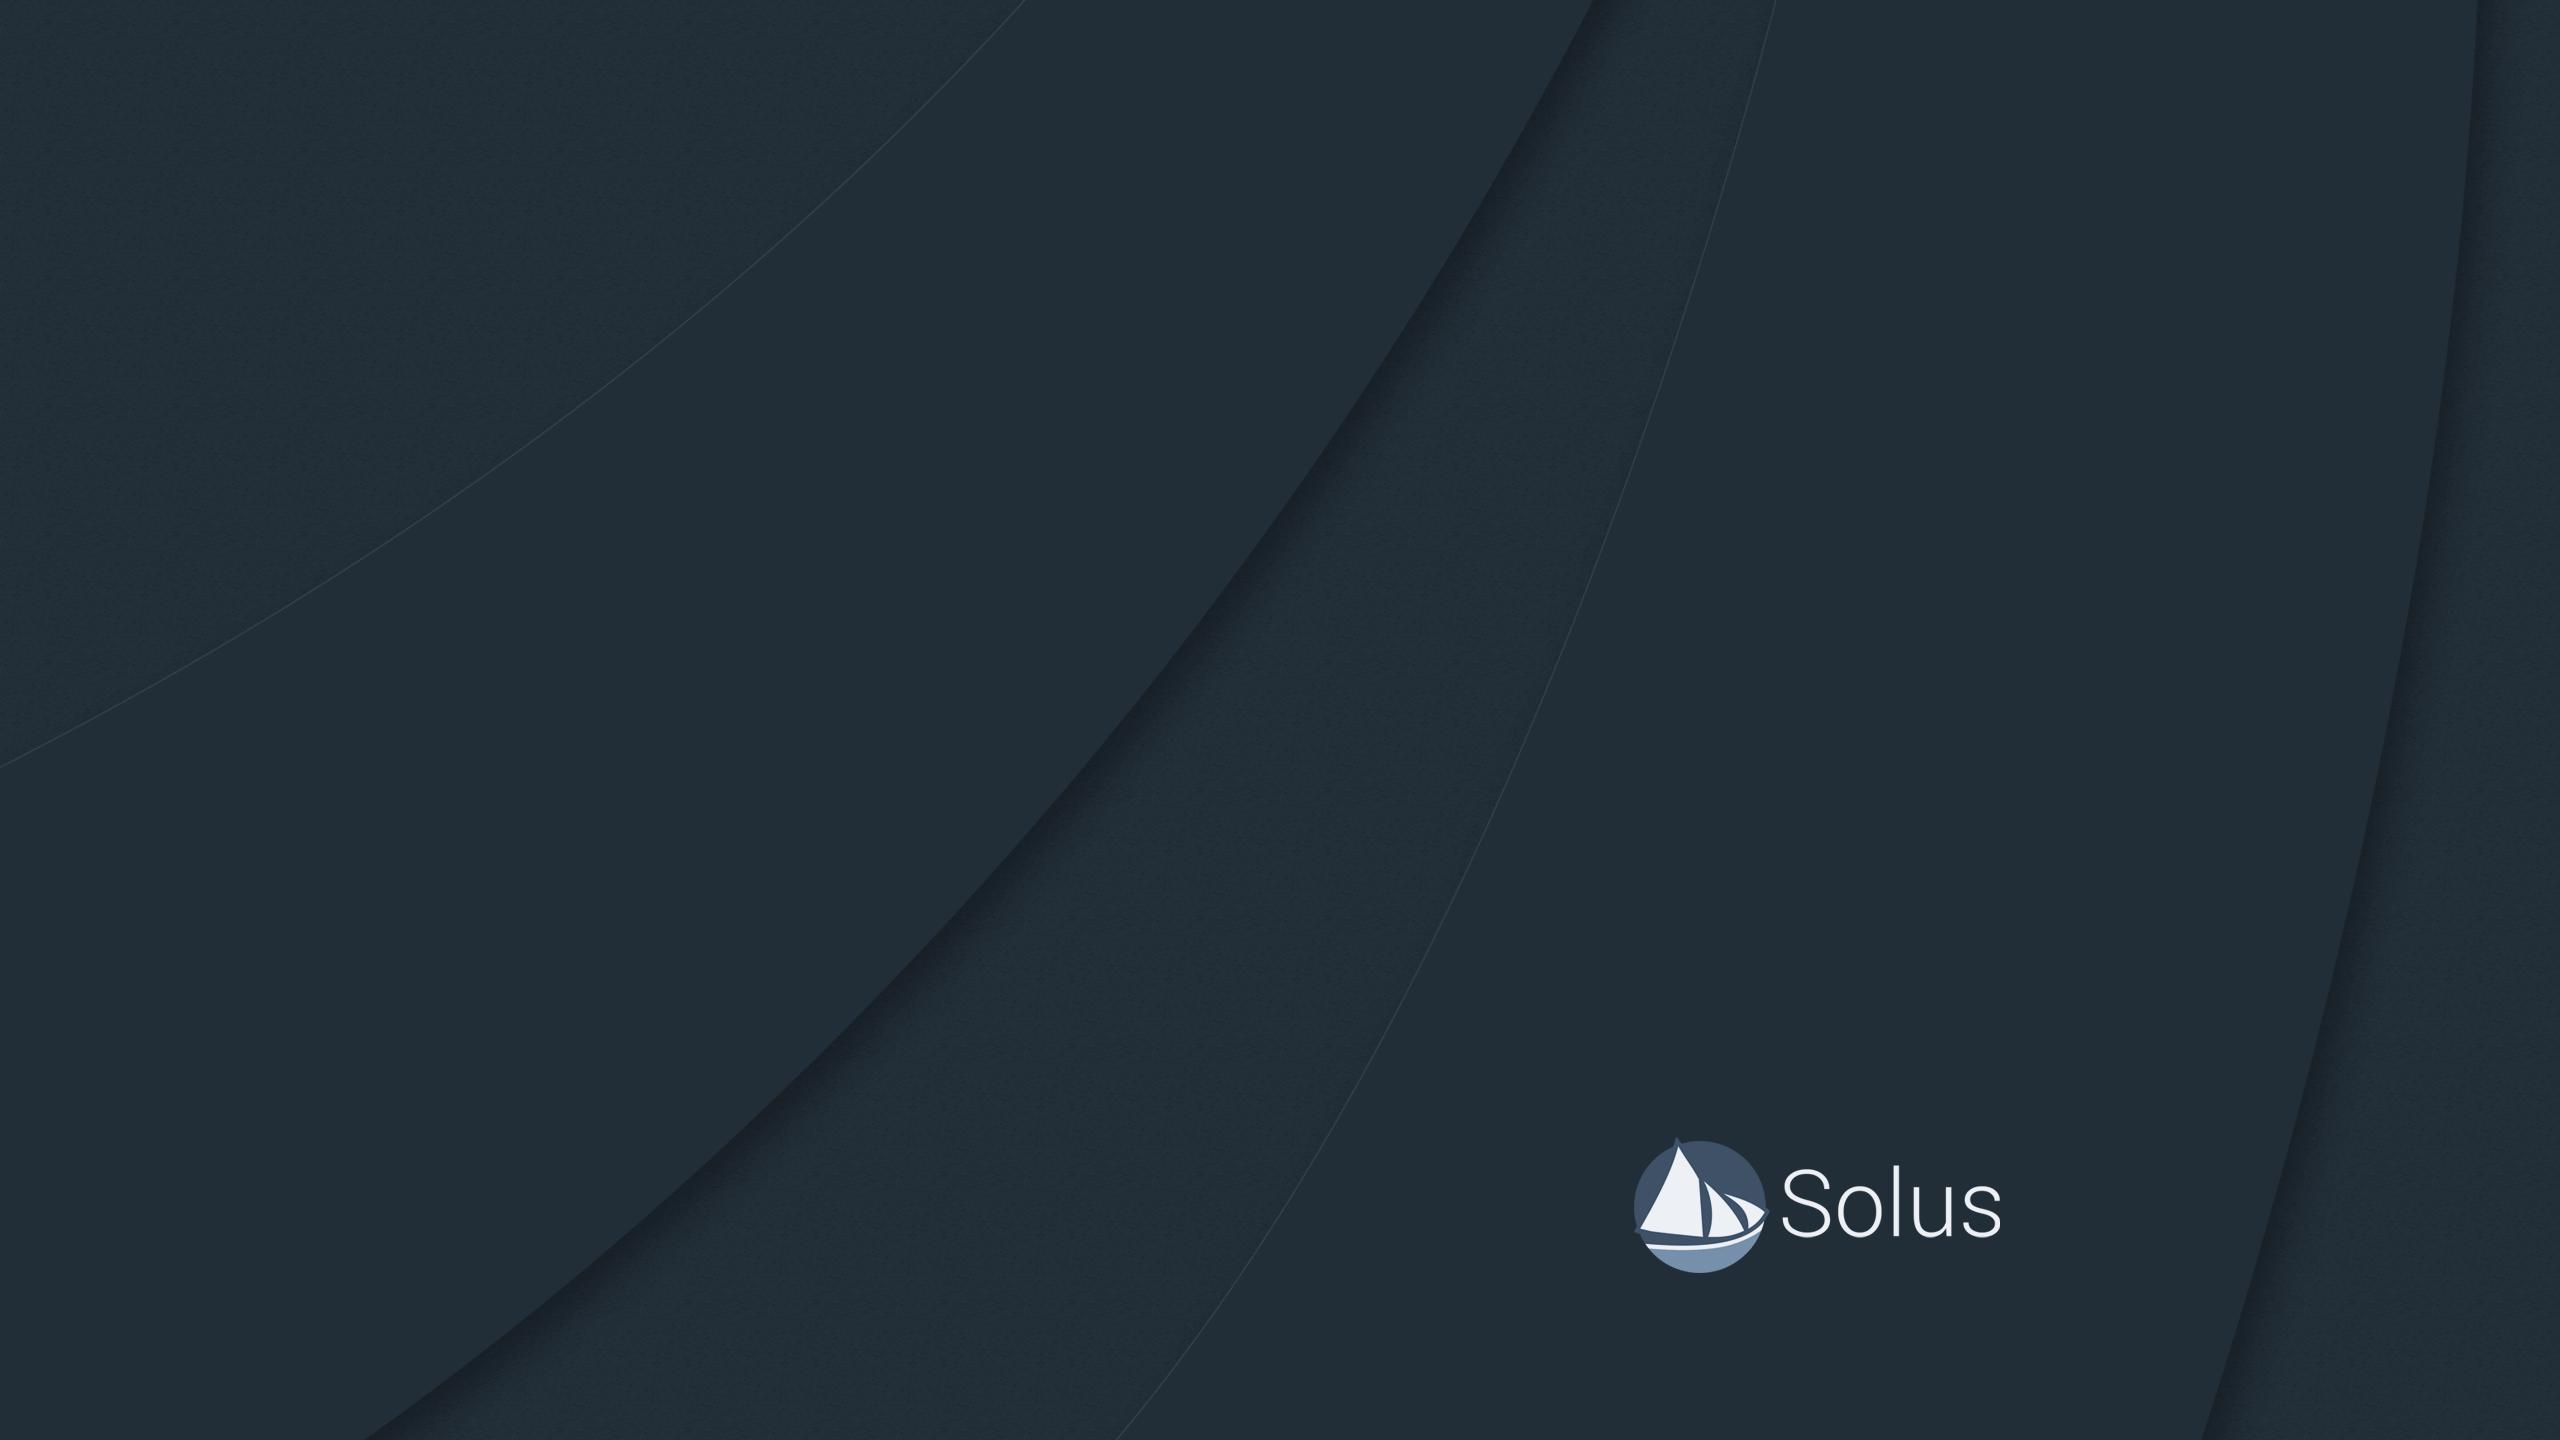 SolusLogoCurved